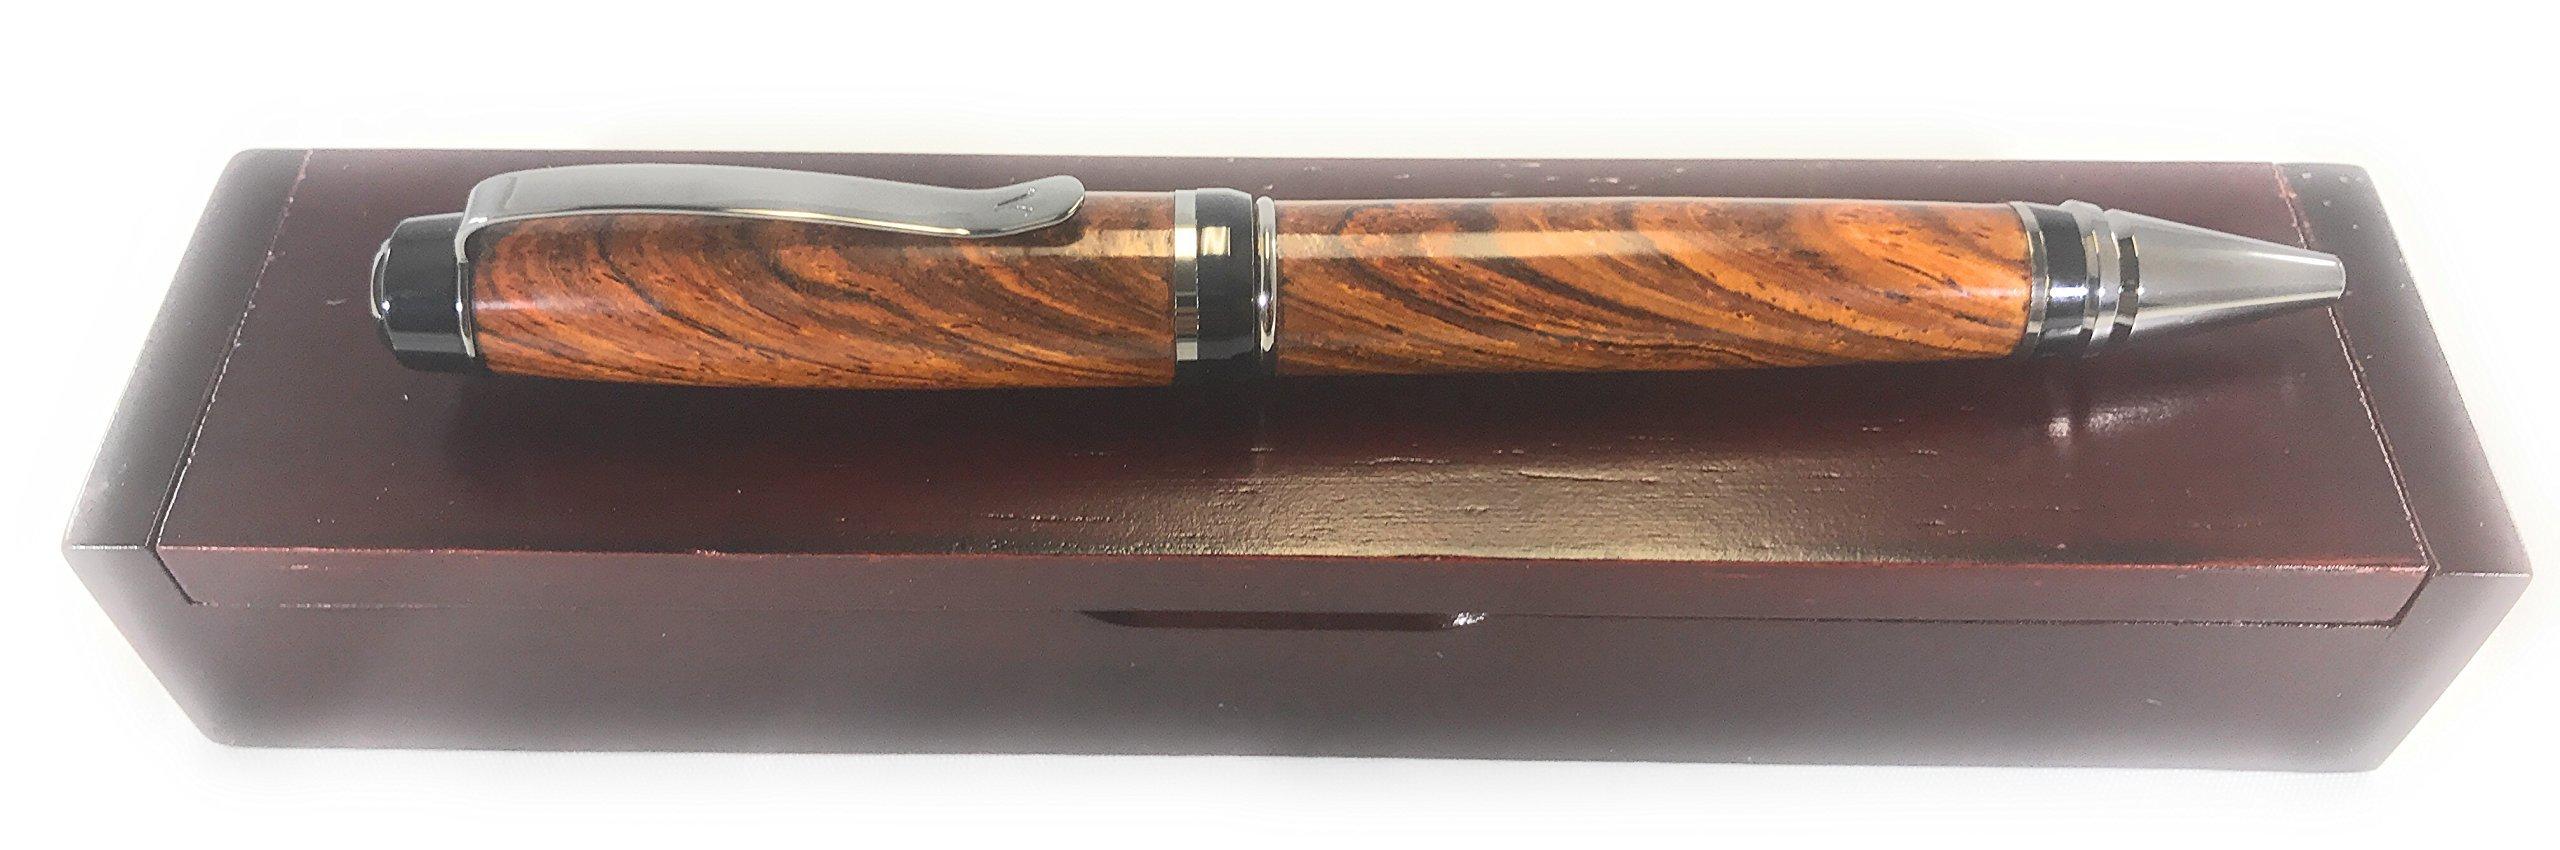 Bendecidos Handmade Pens - Cocobolo Handmade Ballpoint Pen